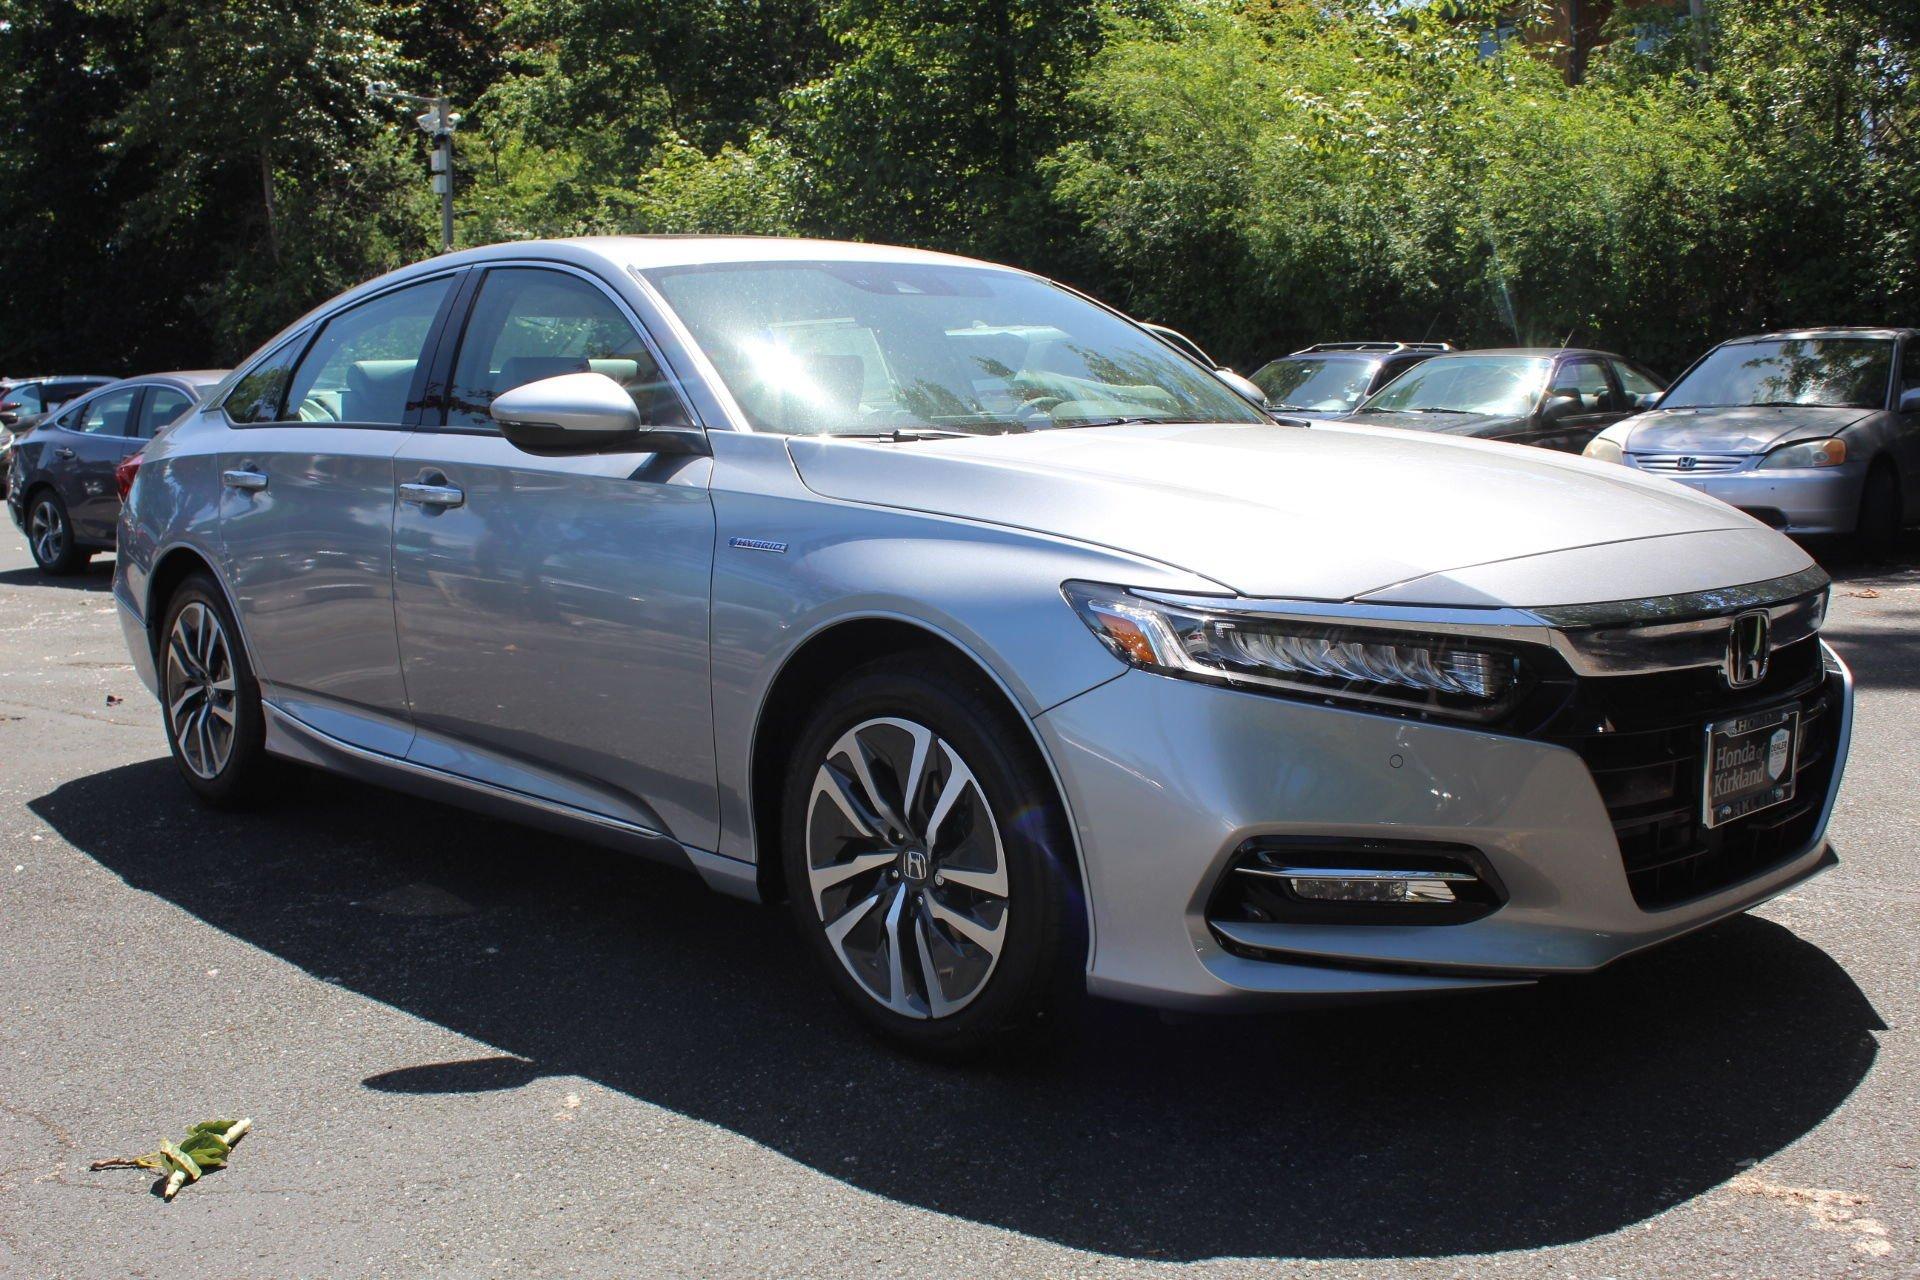 New 2019 Honda Accord Hybrid Base Sedan for sale $25,320 at M and V Leasing in Brooklyn NY 11223 1